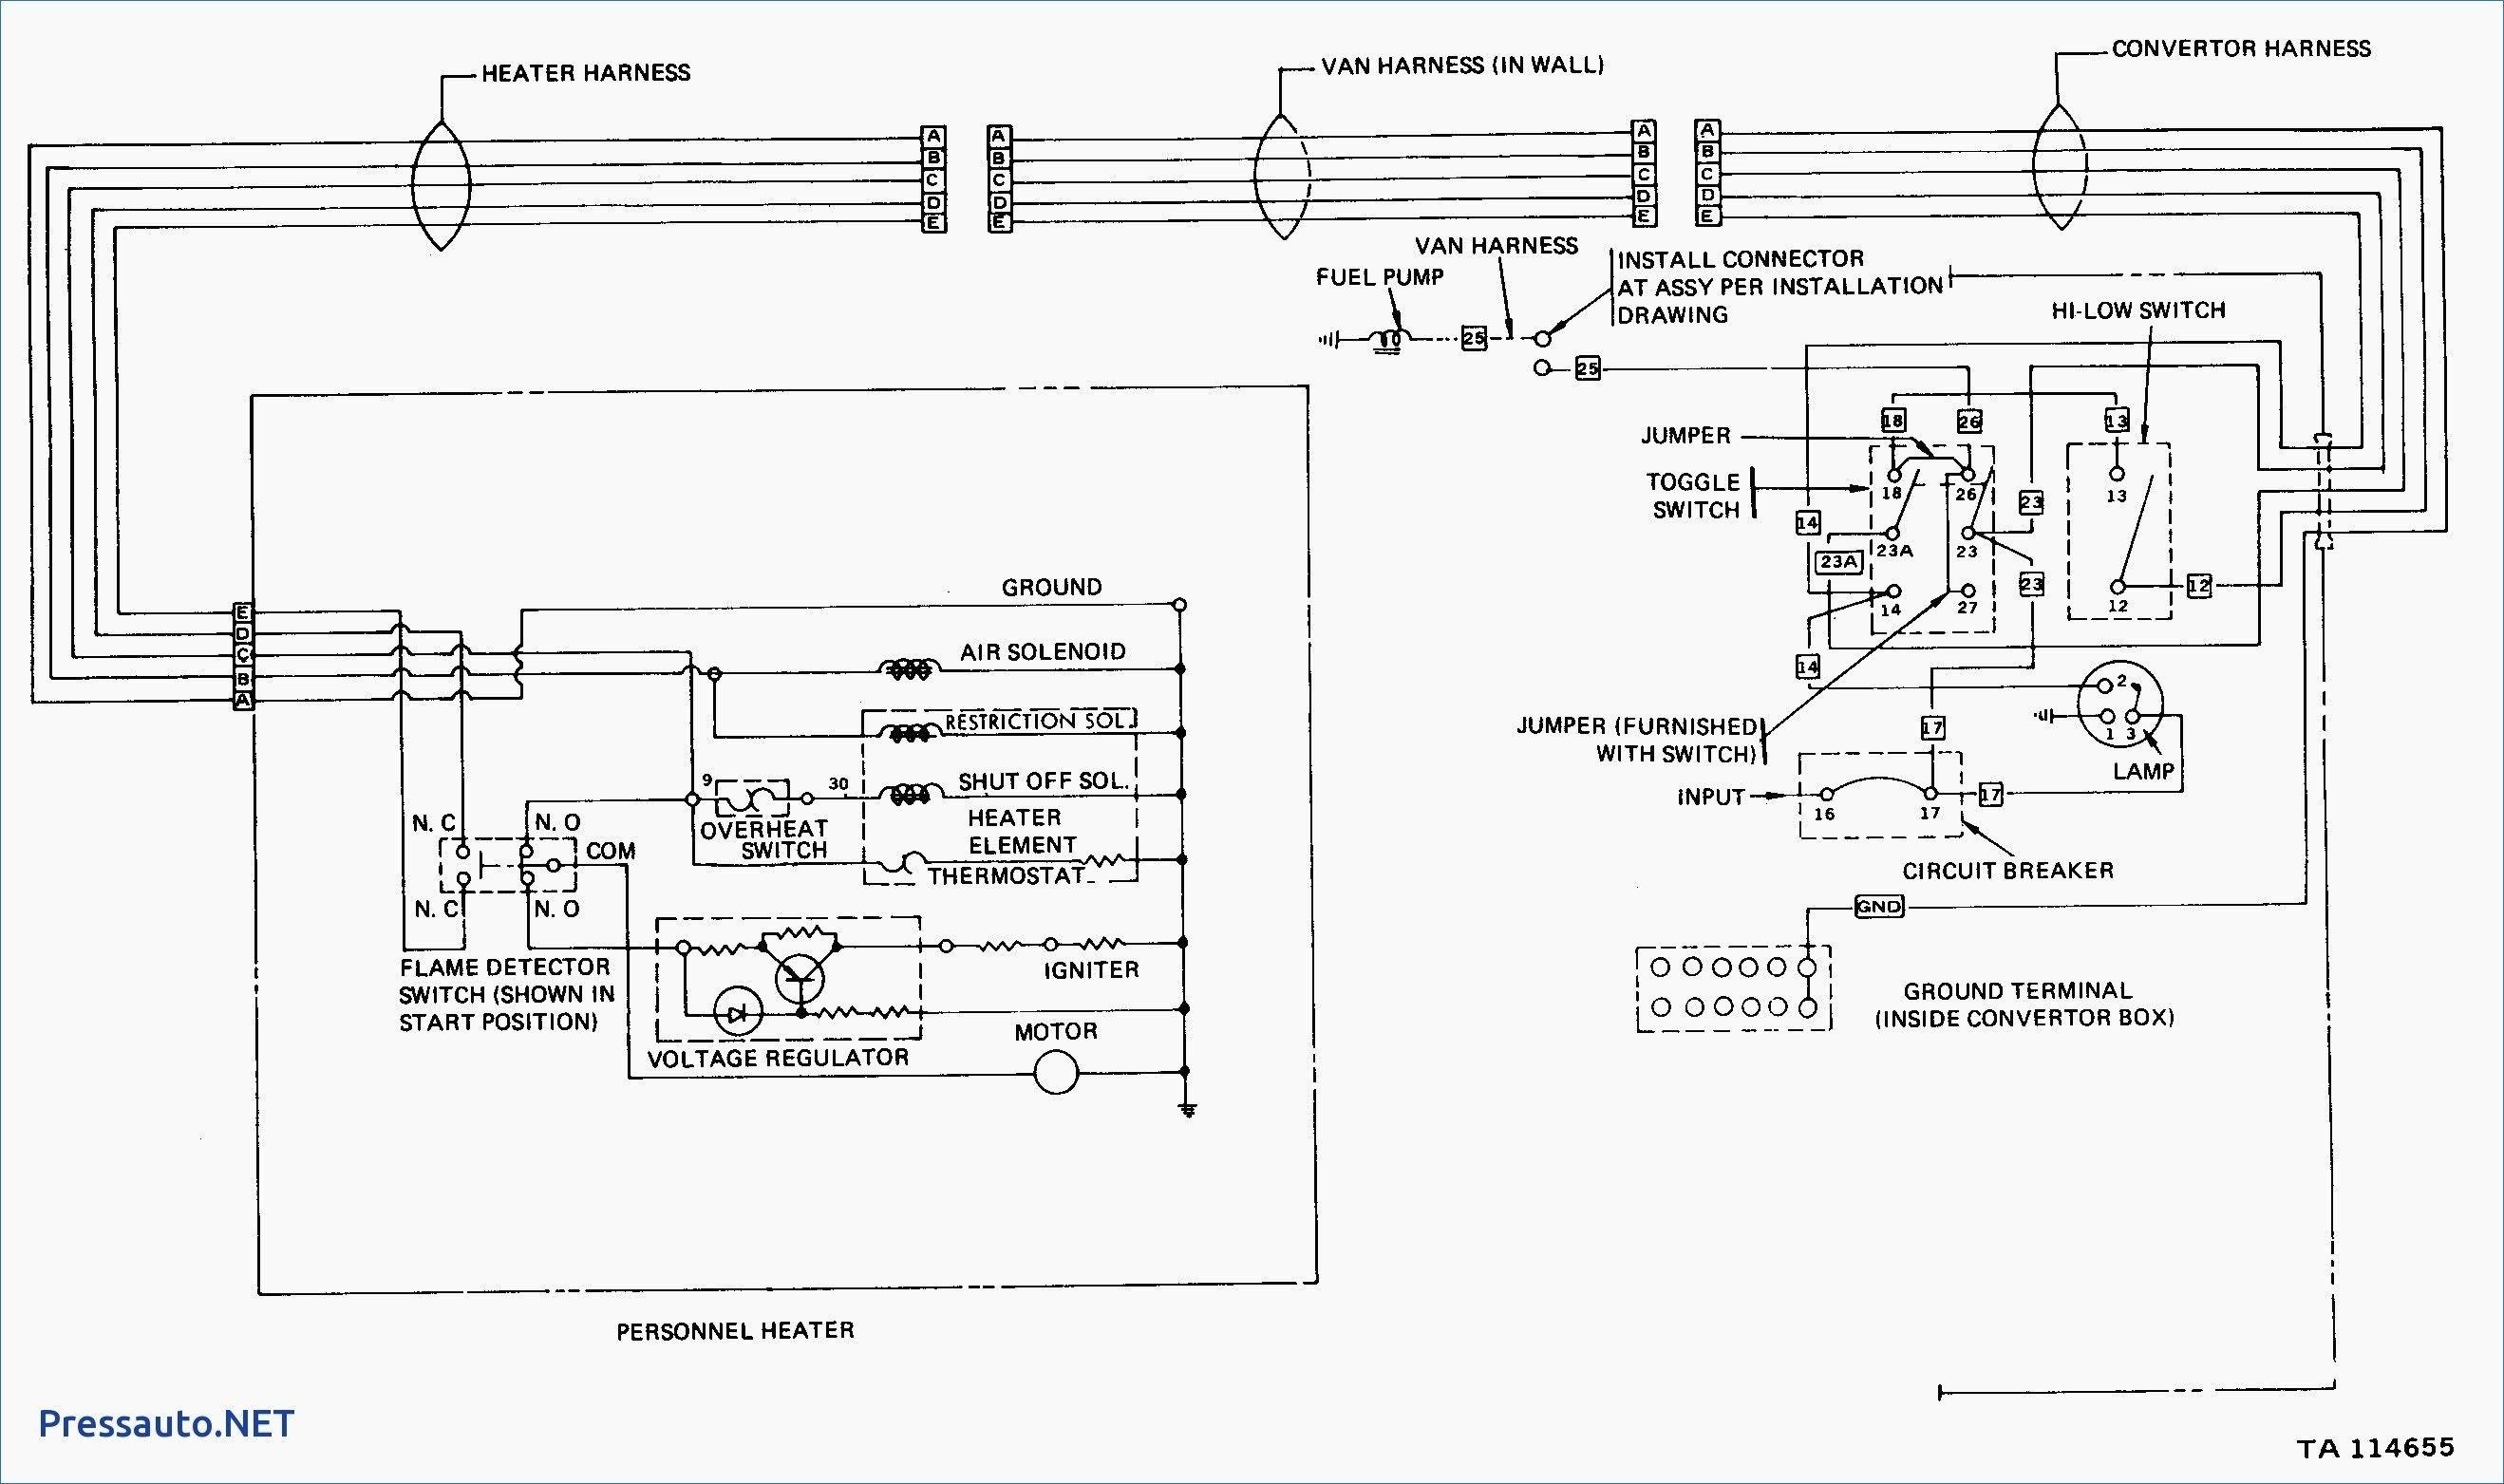 Viper 3305v Wiring Diagram Elegant In 2020 About Me Blog Viper Alarm Wire